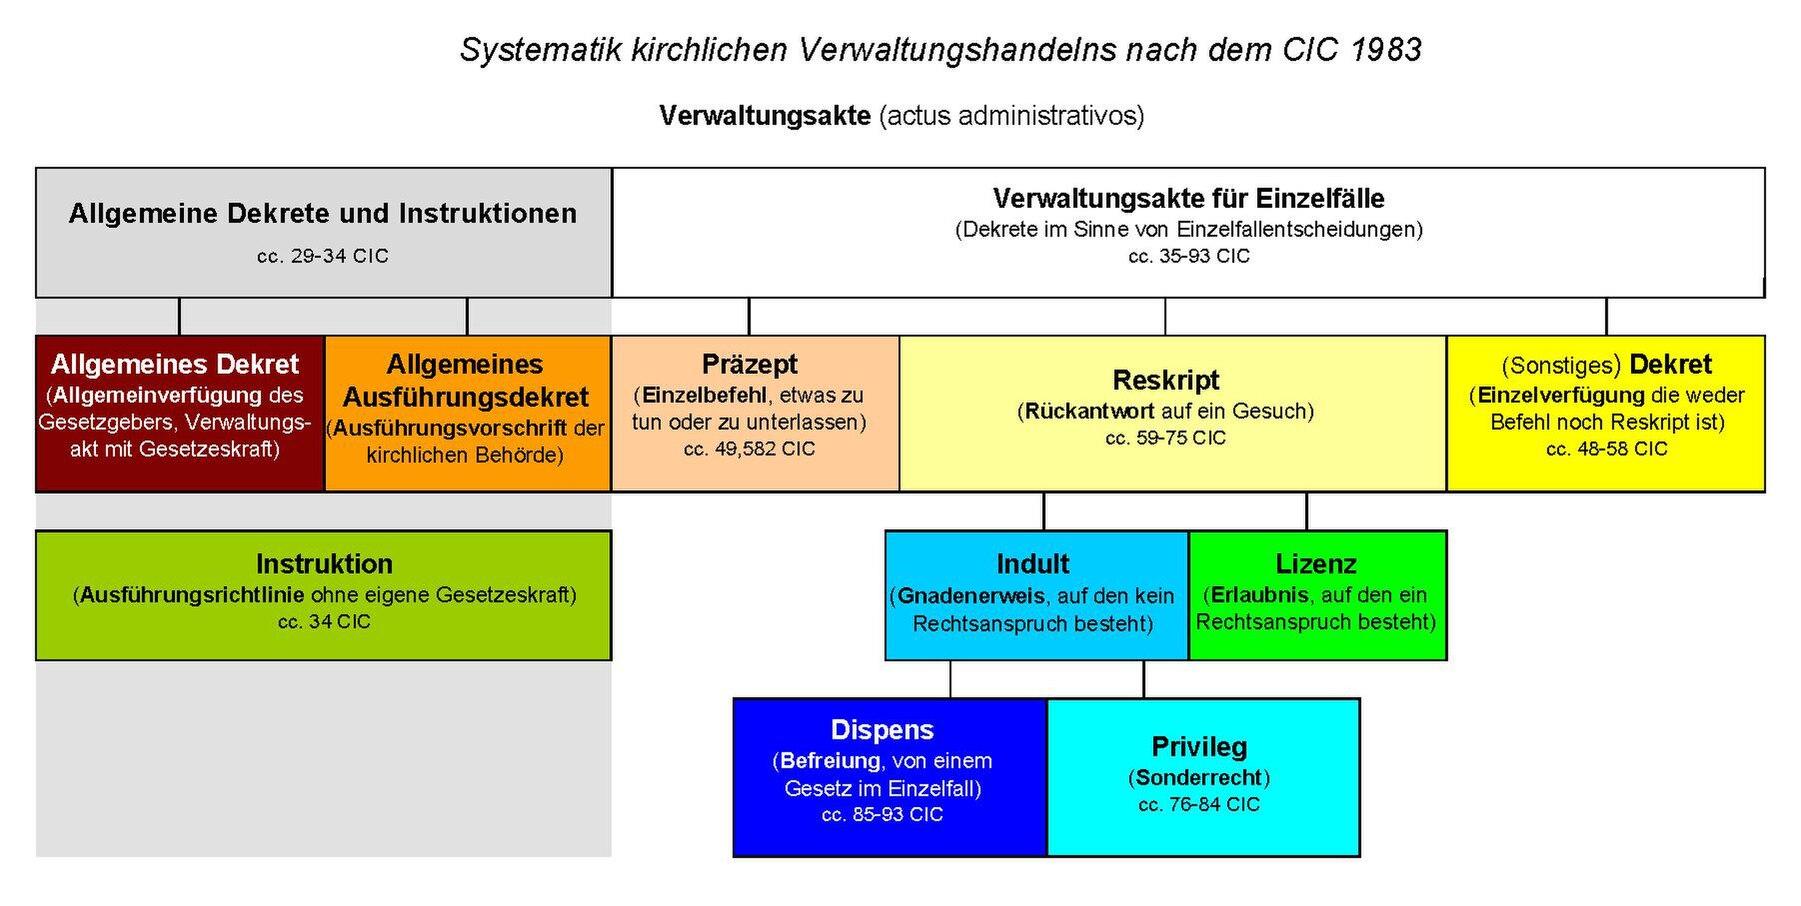 cic pr application picture size